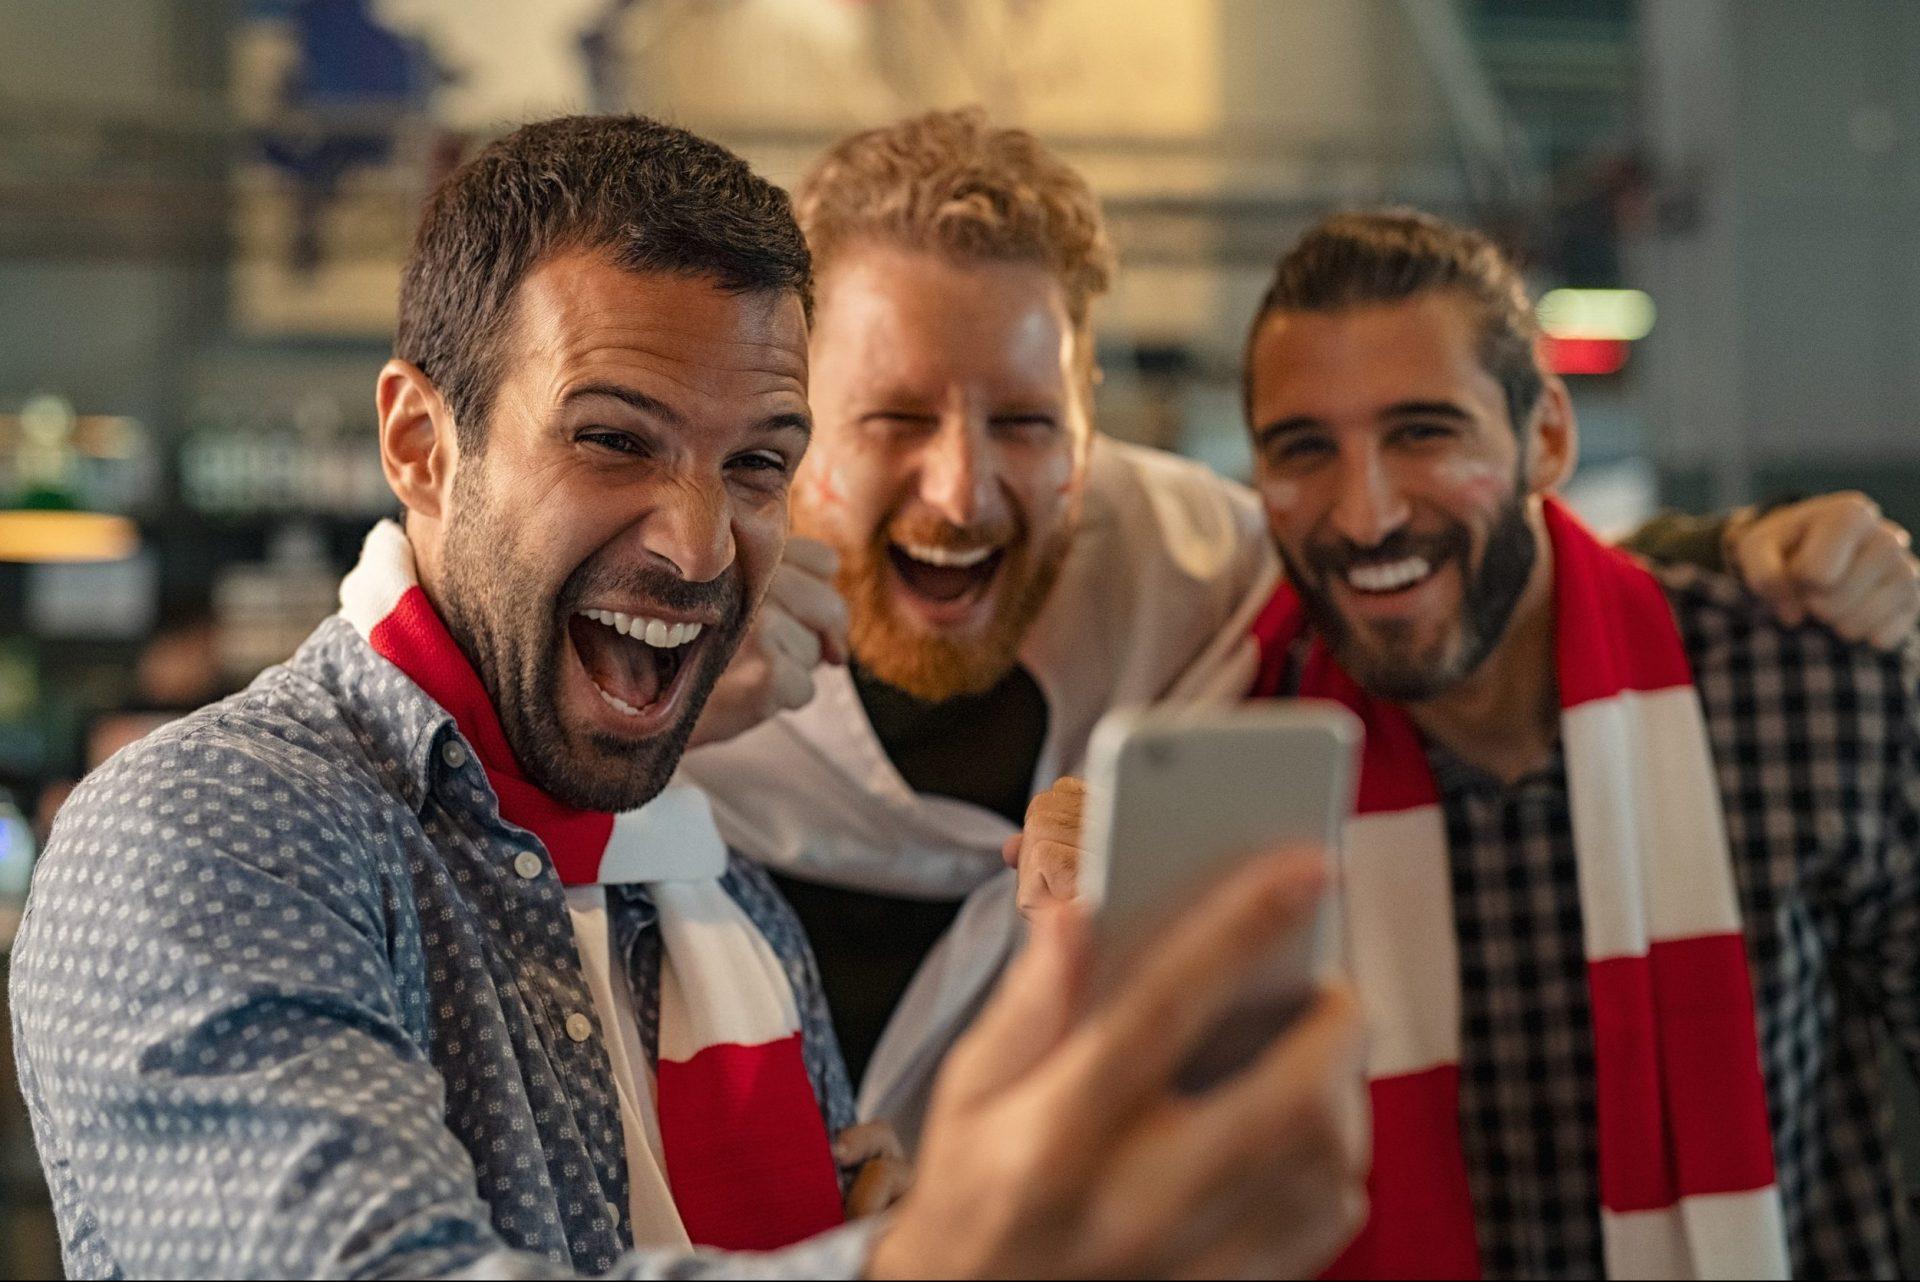 Football fans watching match on smartphone